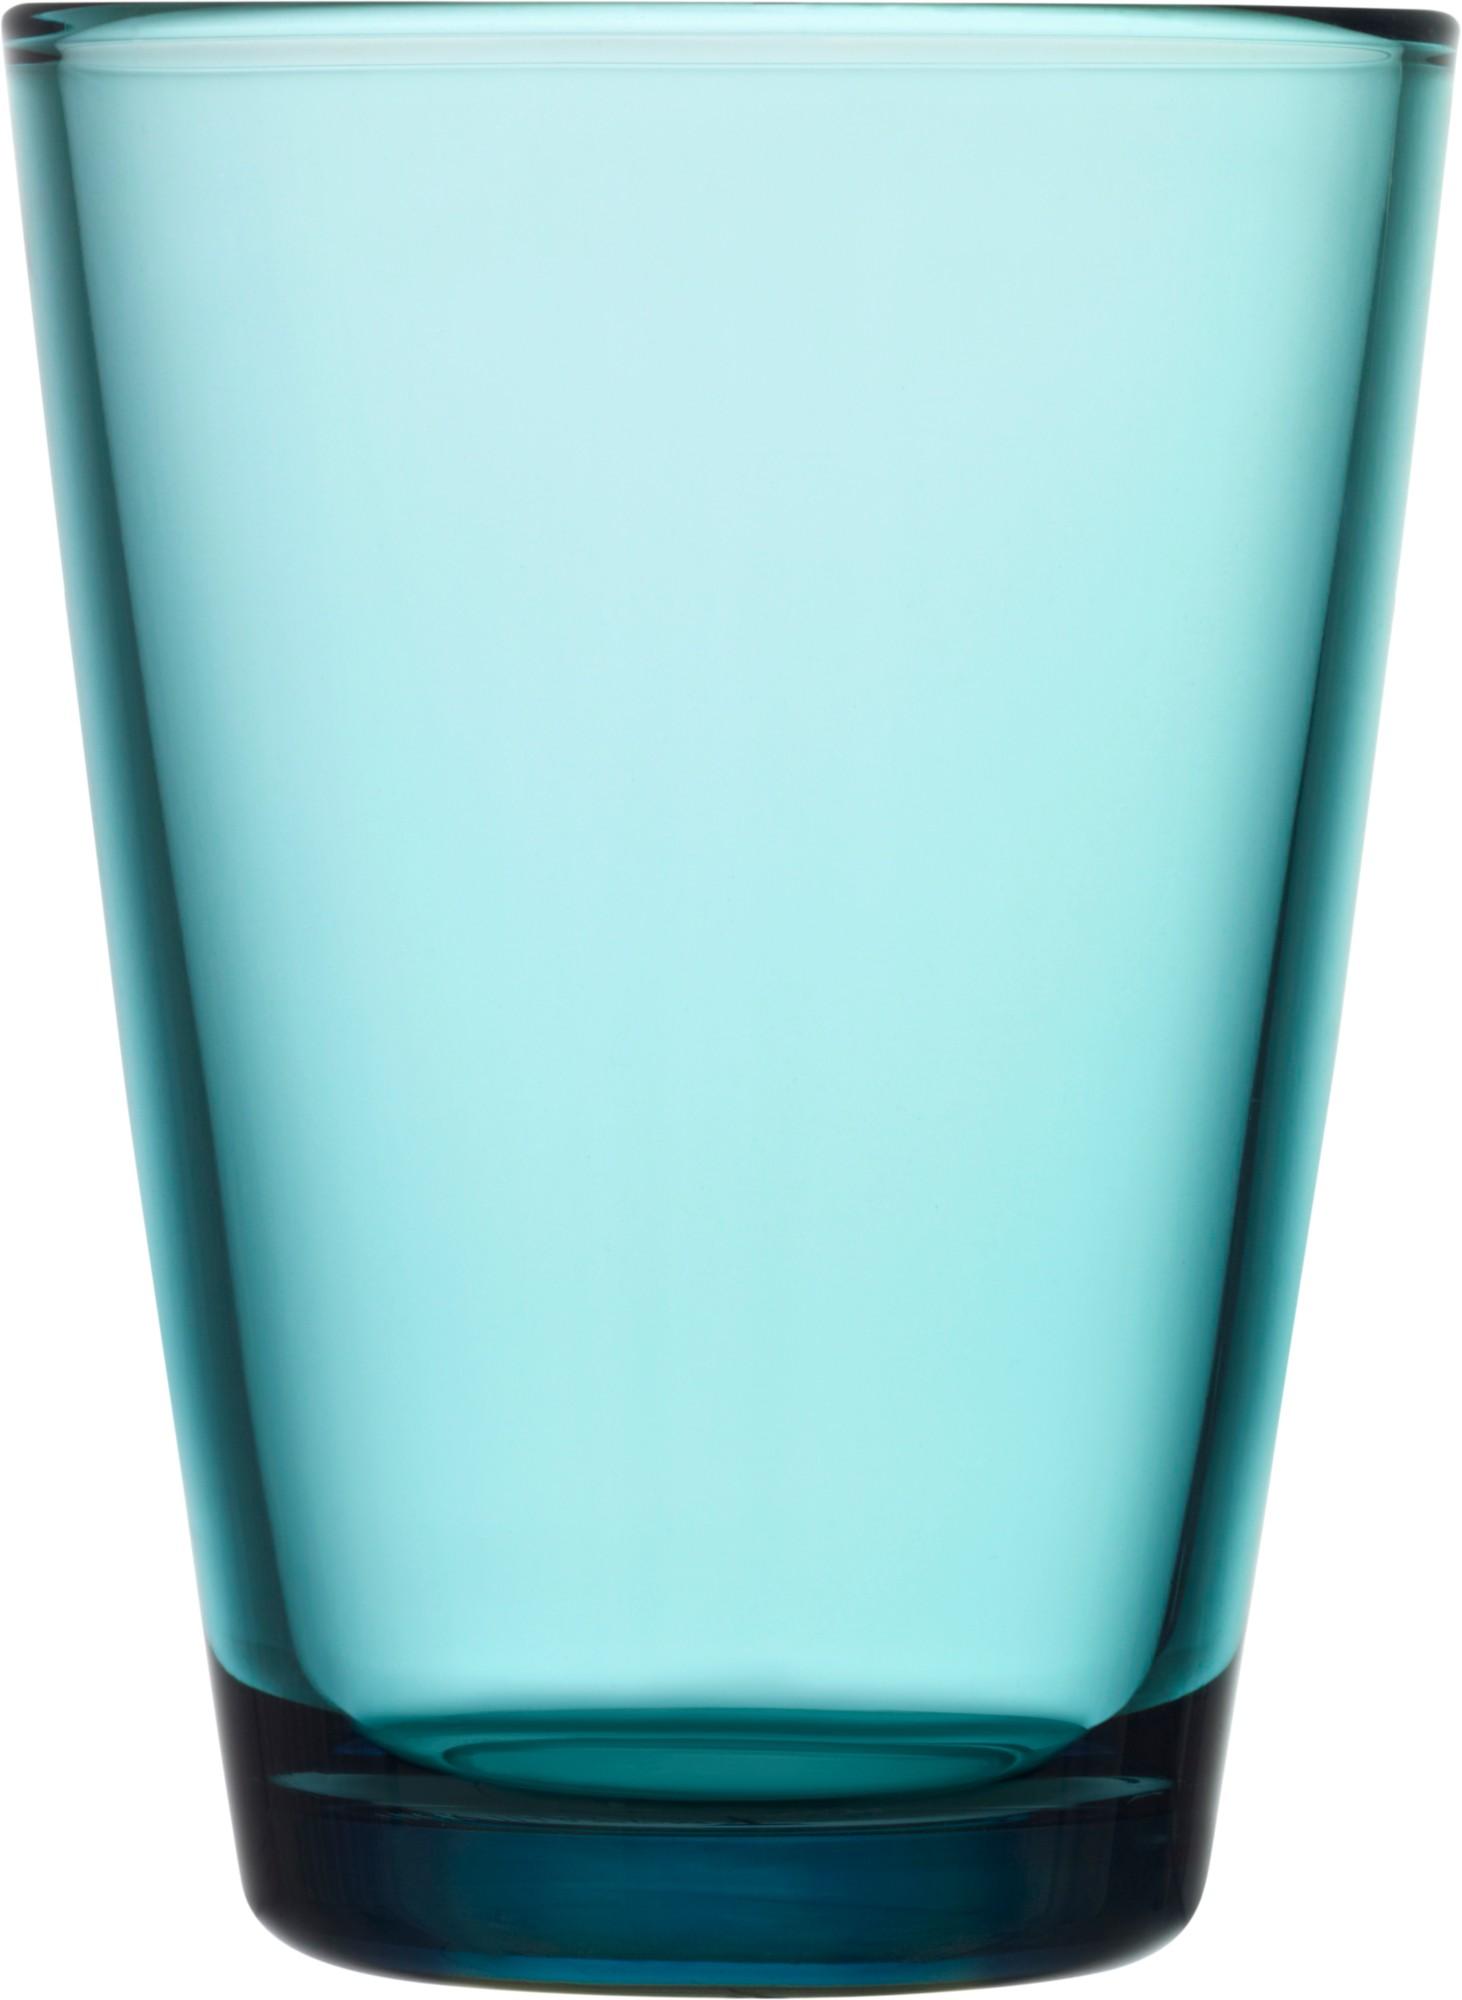 Iittala - Kartio juomalasi 40 cl merensininen 2 kpl - Iittala.com FI c46274b1b9